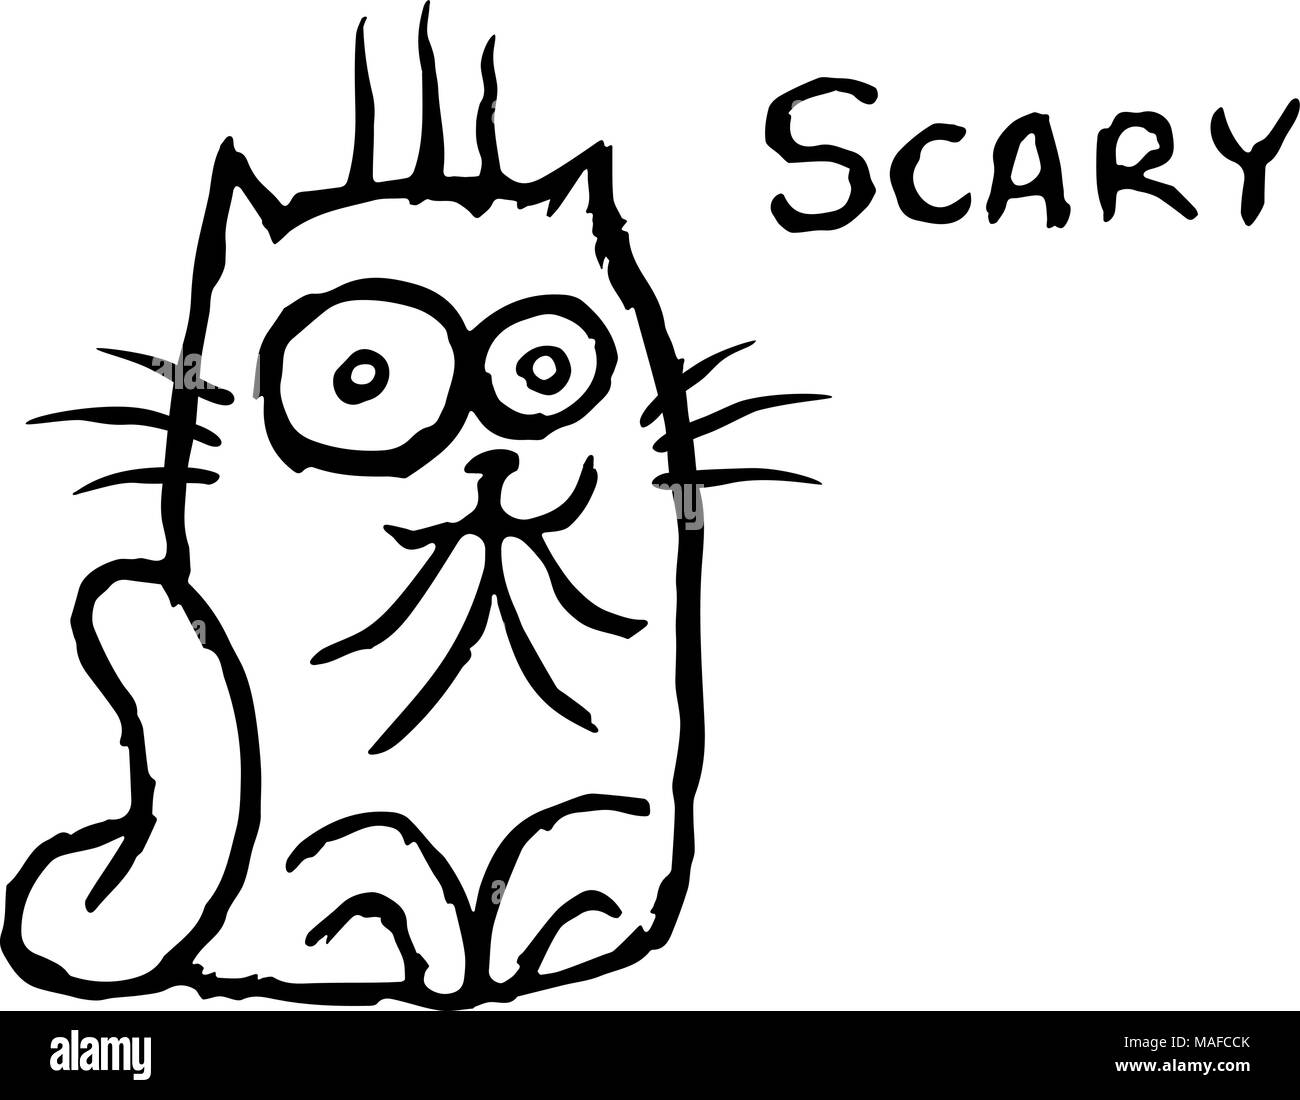 Cat Tik Was Scared Vector Illustration Cheerful Cartoon Pet